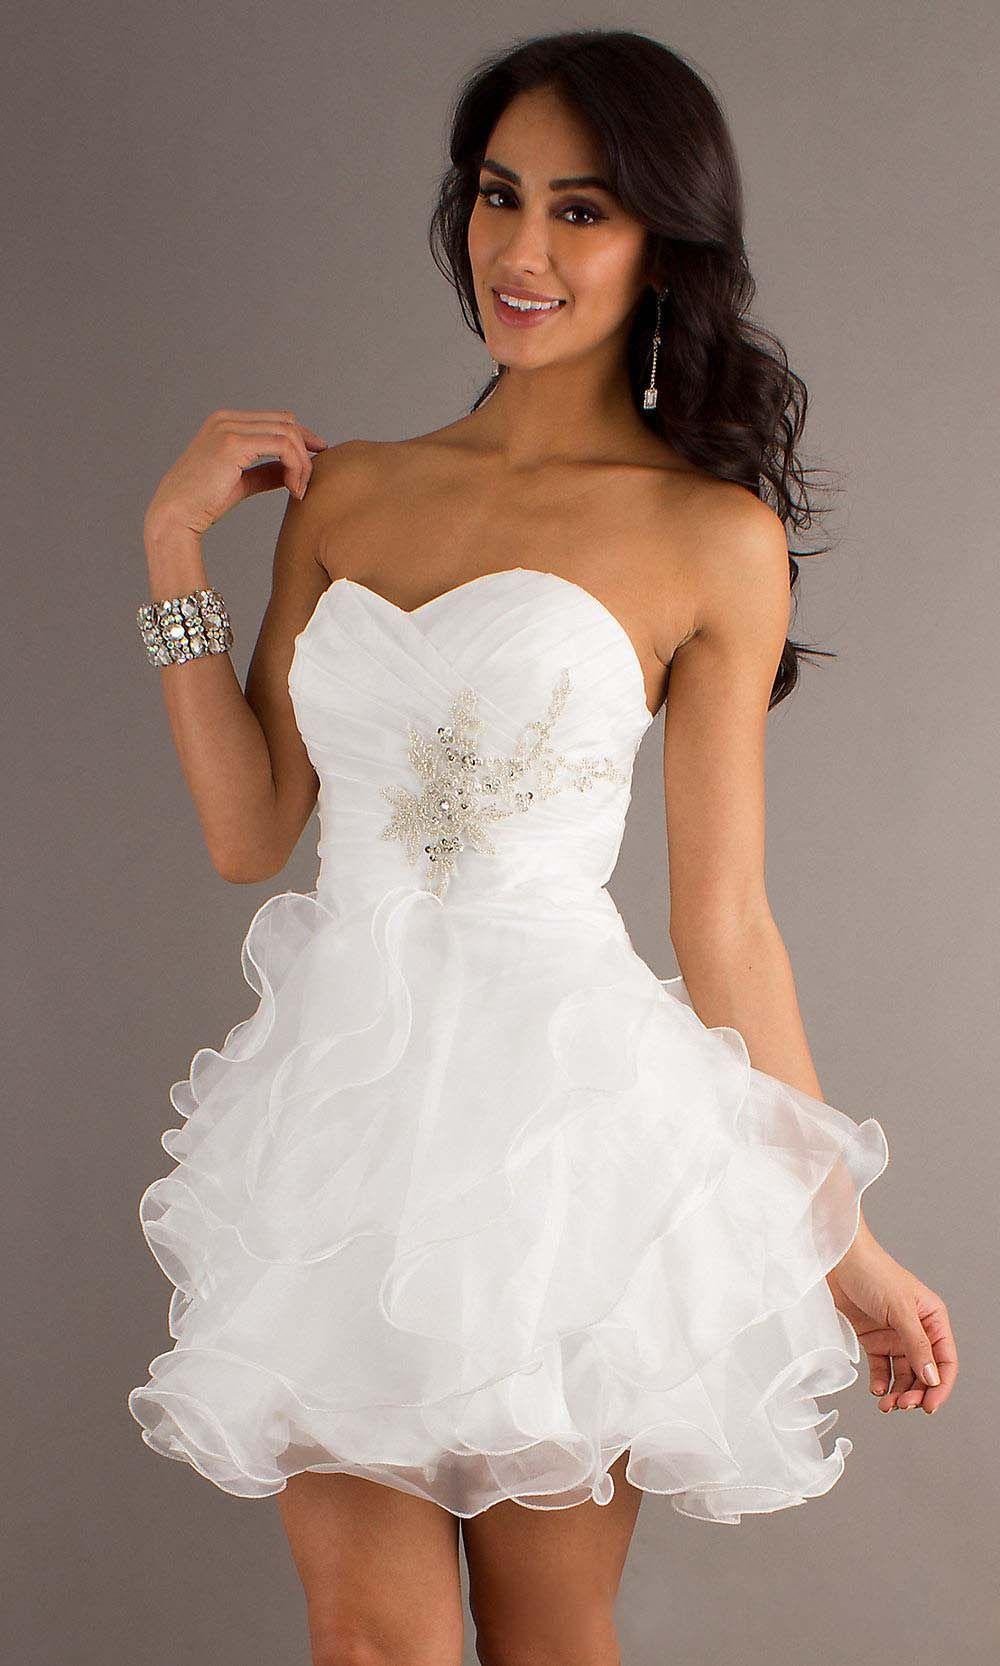 Cheap short cute aline sweetheart prom dress in love wthis